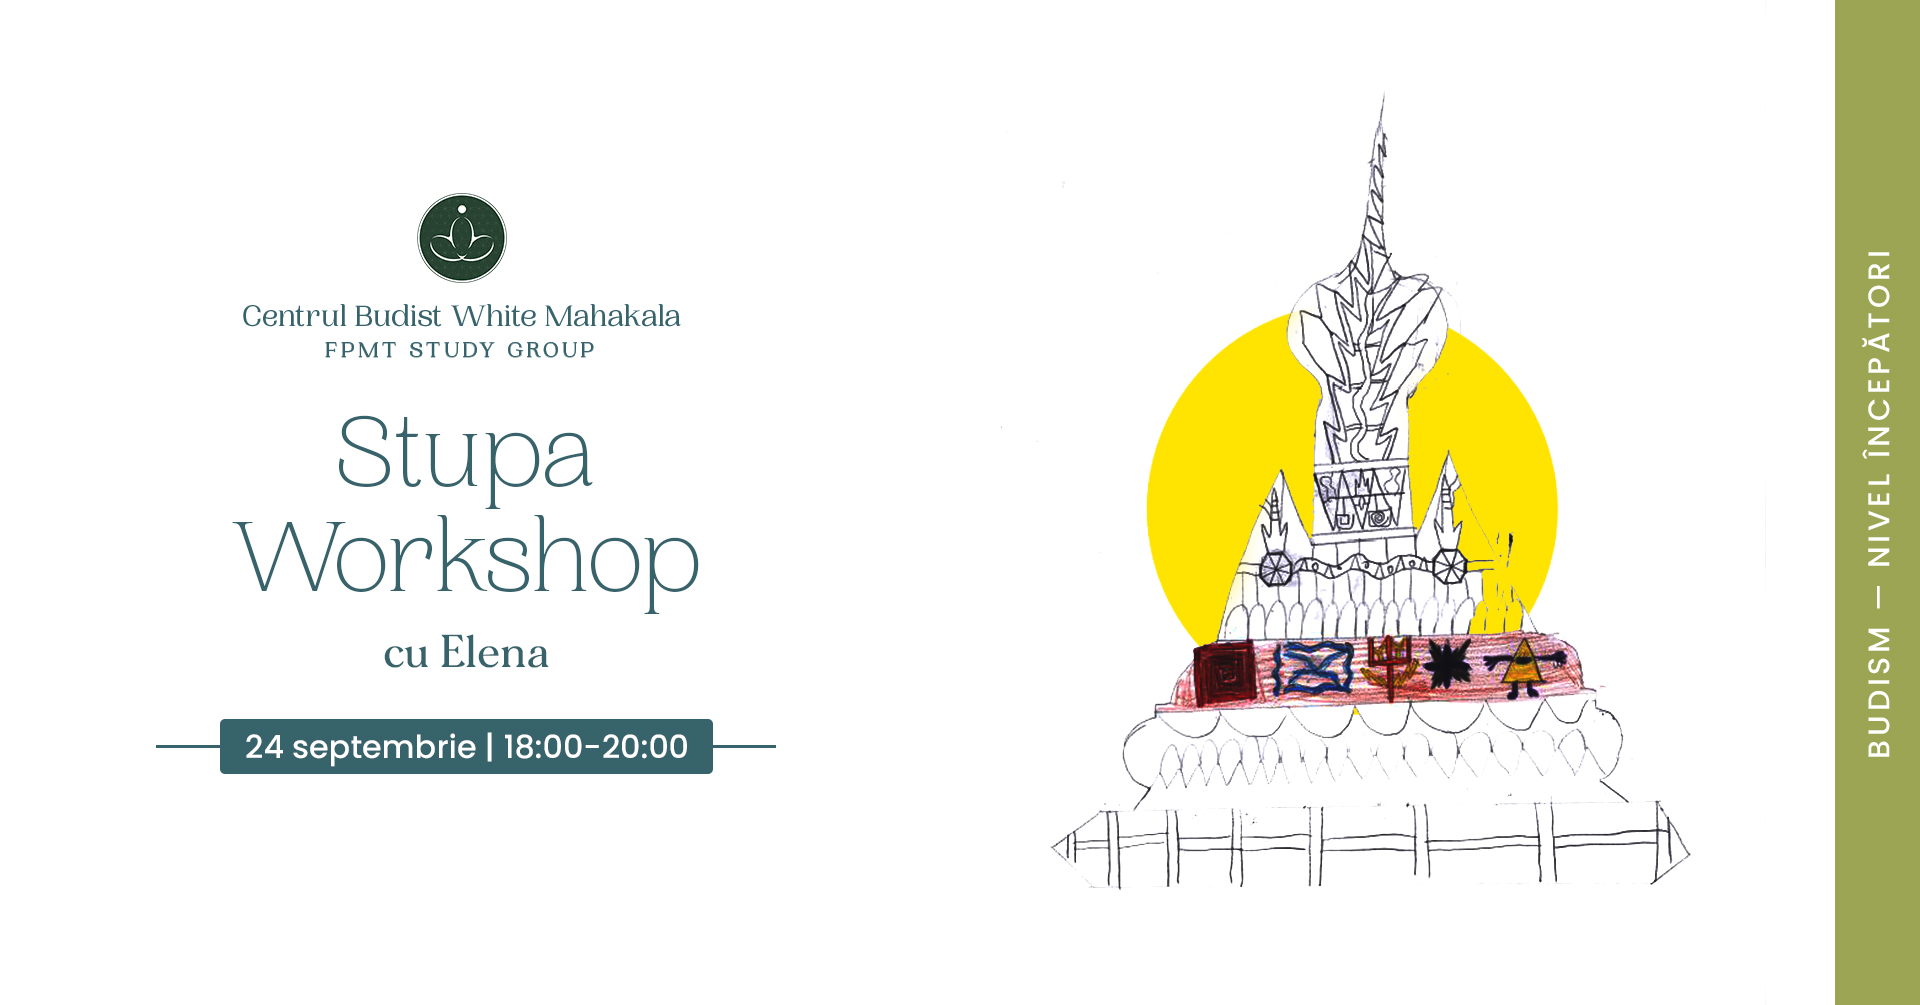 Stupa workshop